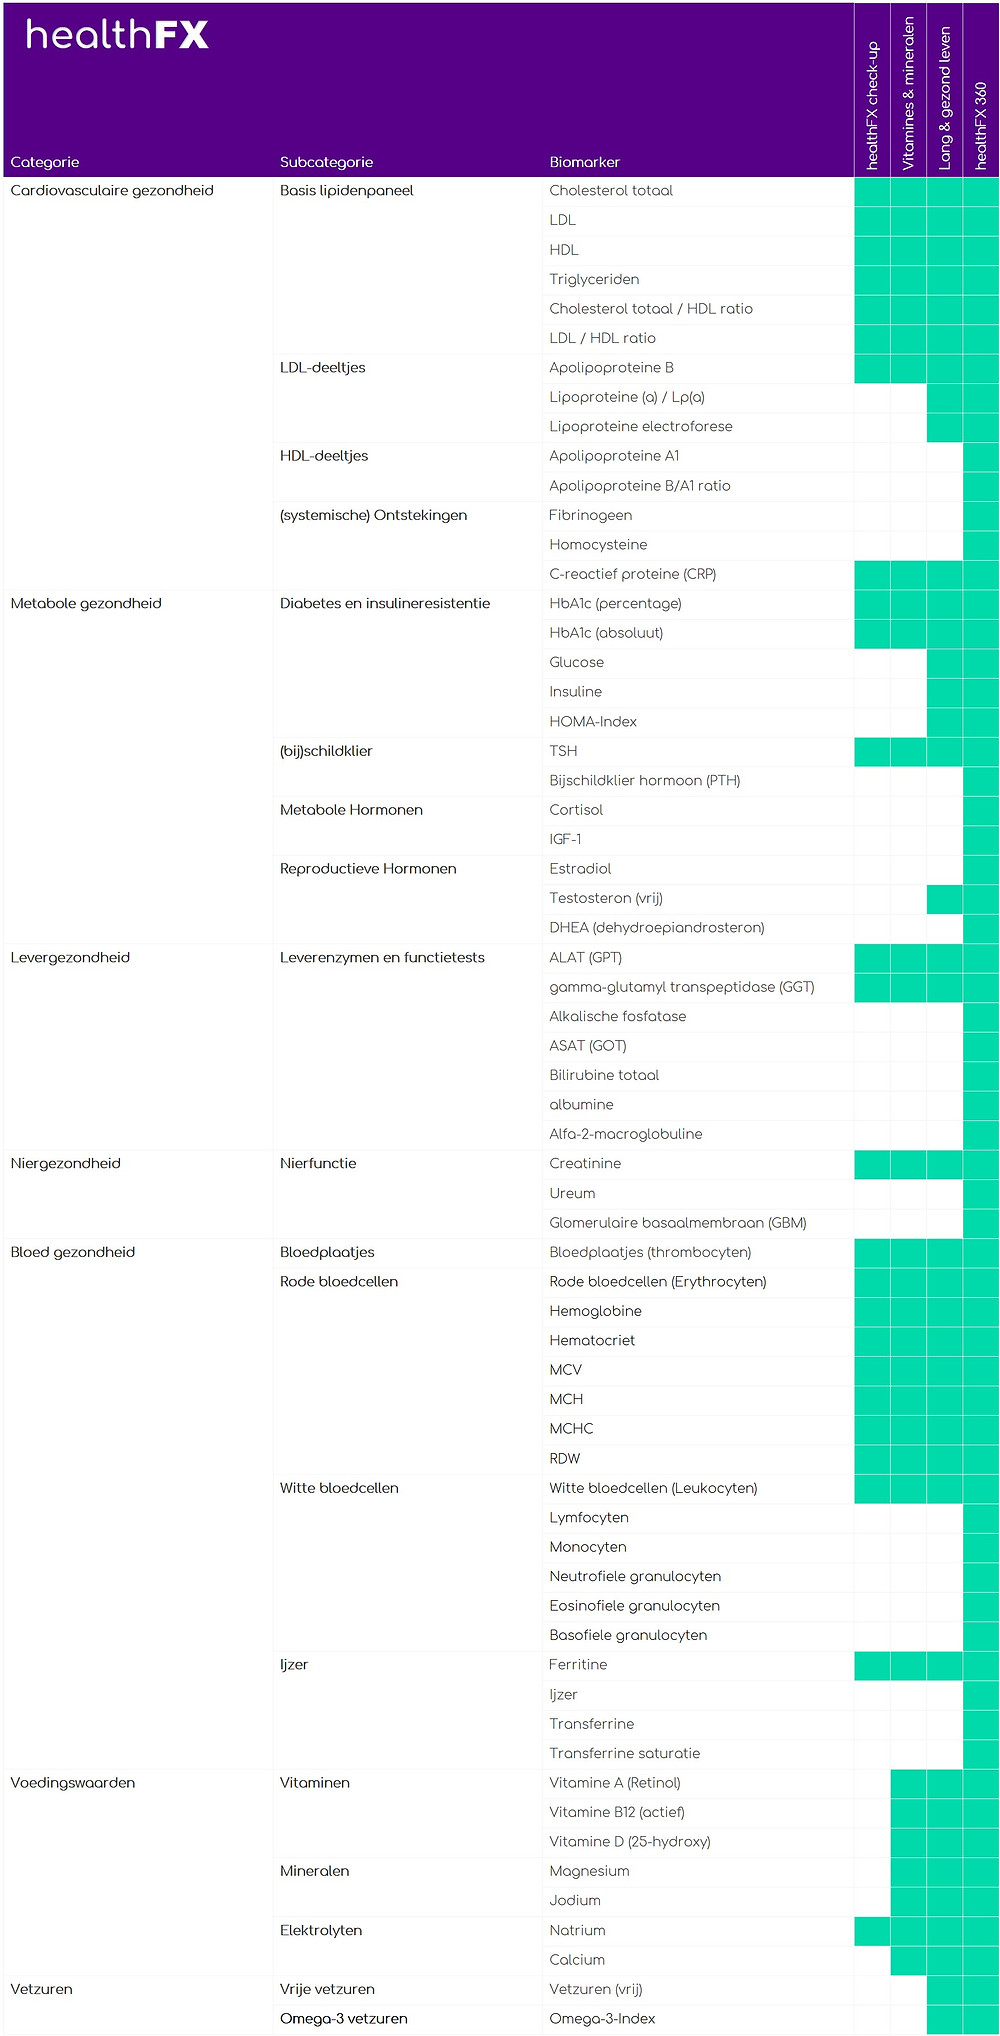 Biomarkers (bloedwaardentests) per pakket van healthFX